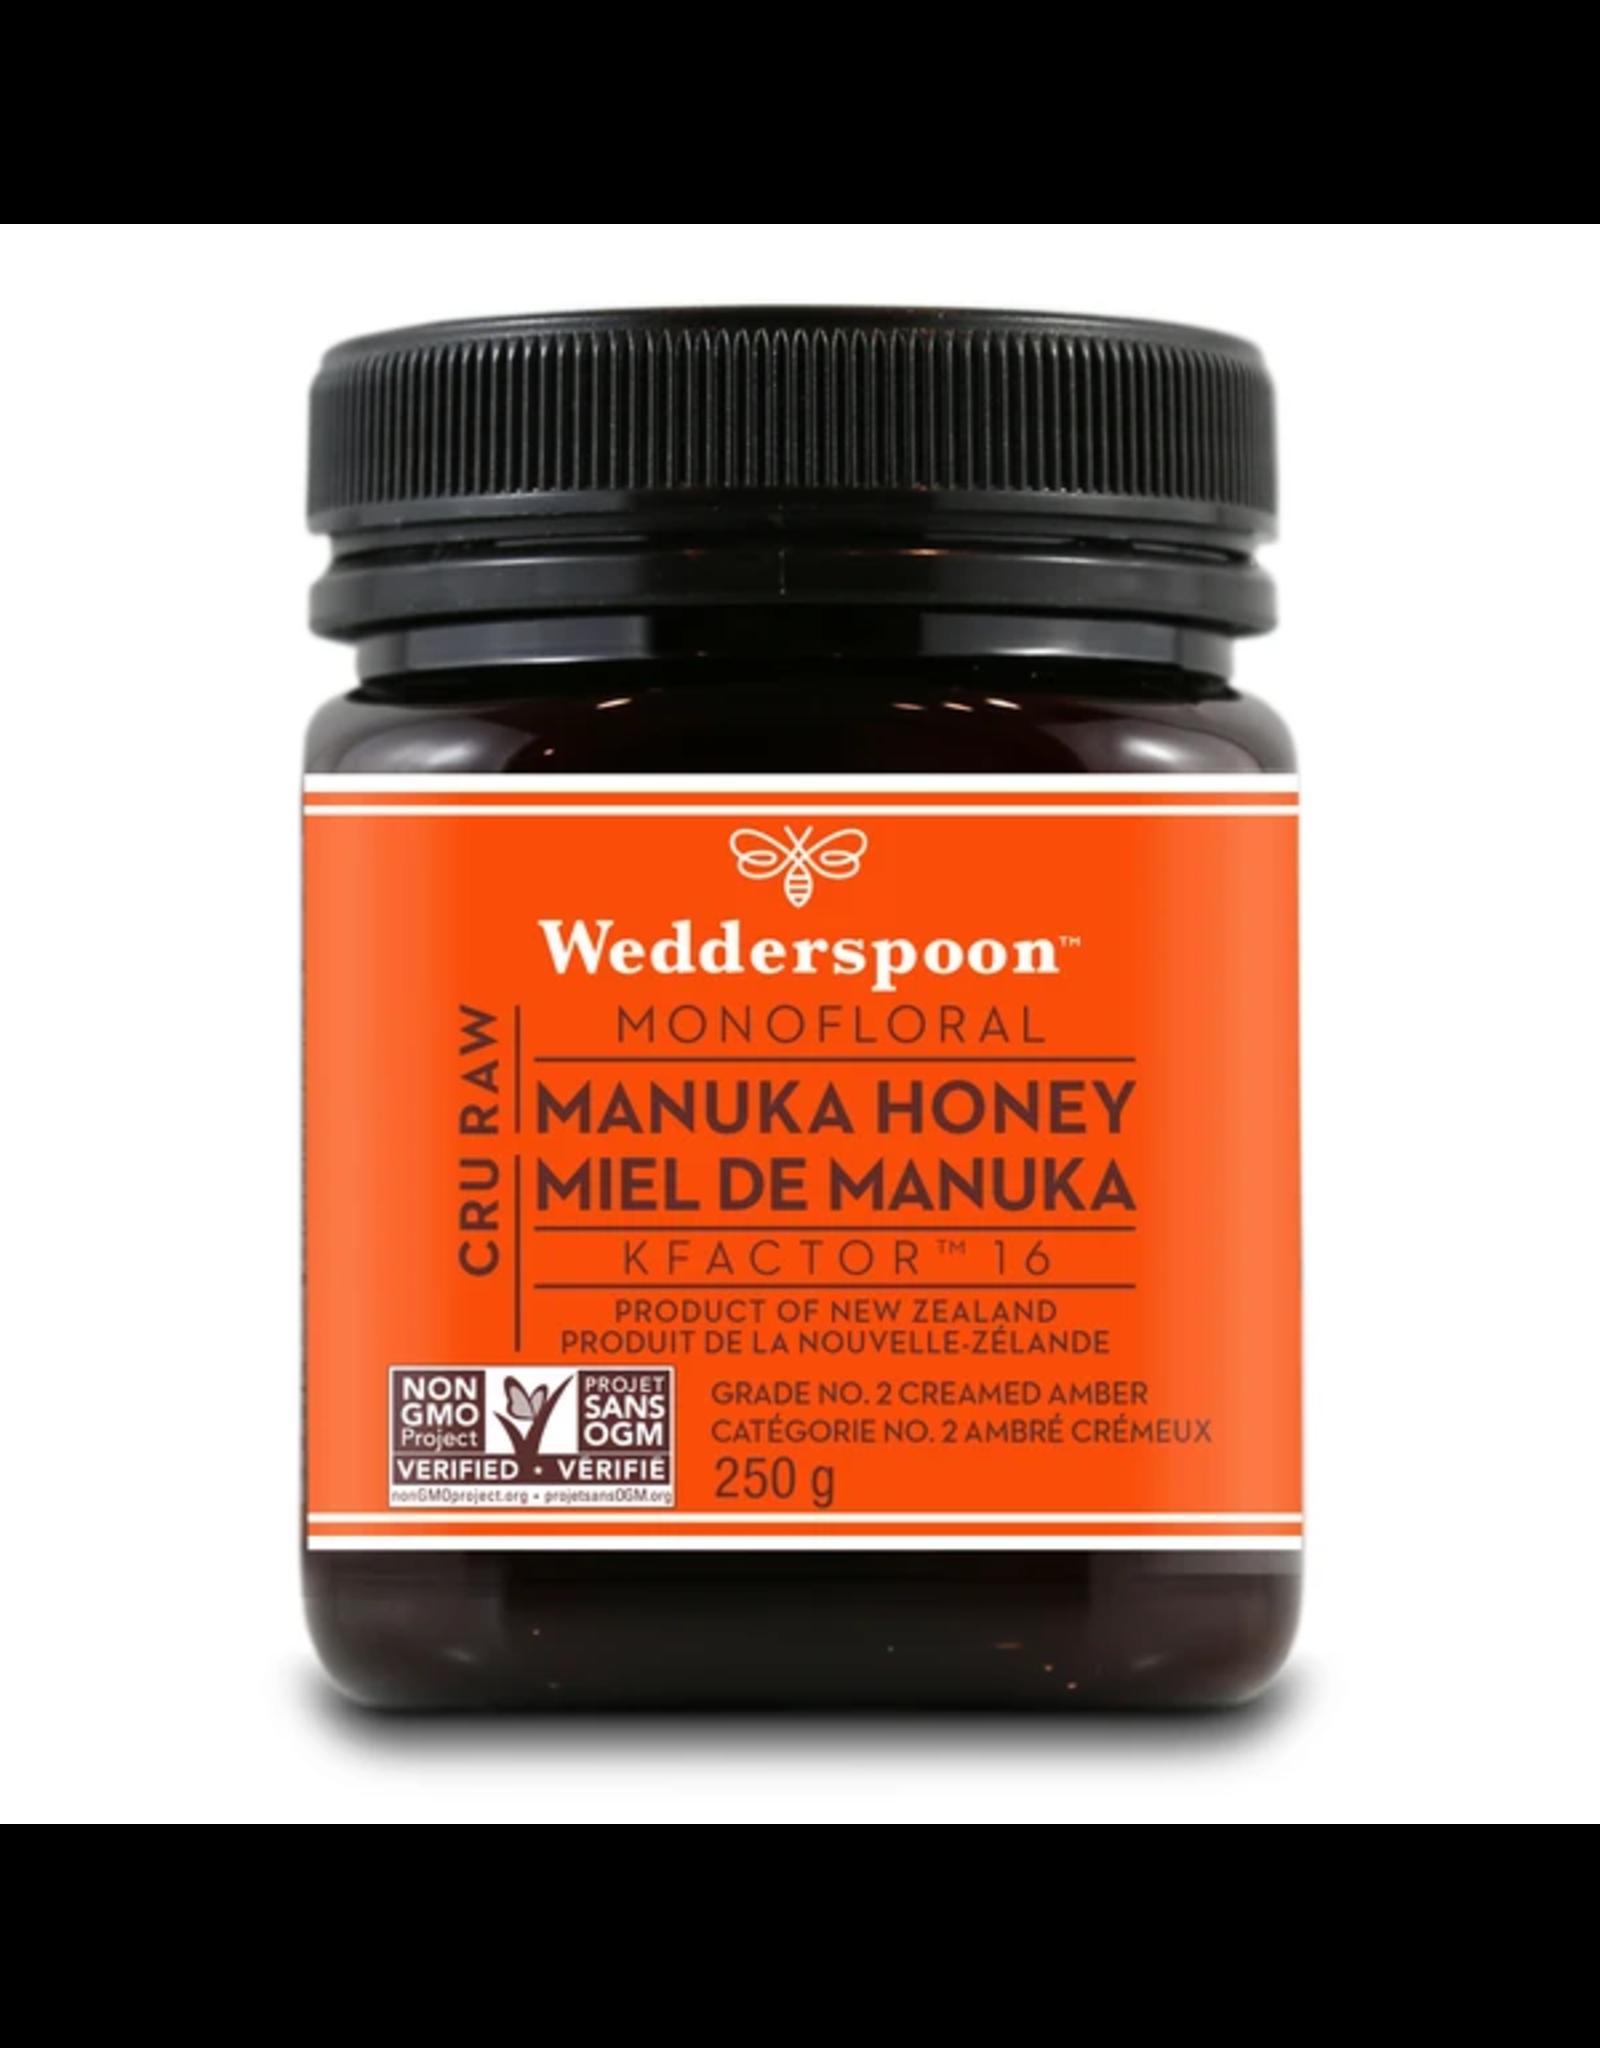 Wedderspoon Manuka Honey Kfactor 16